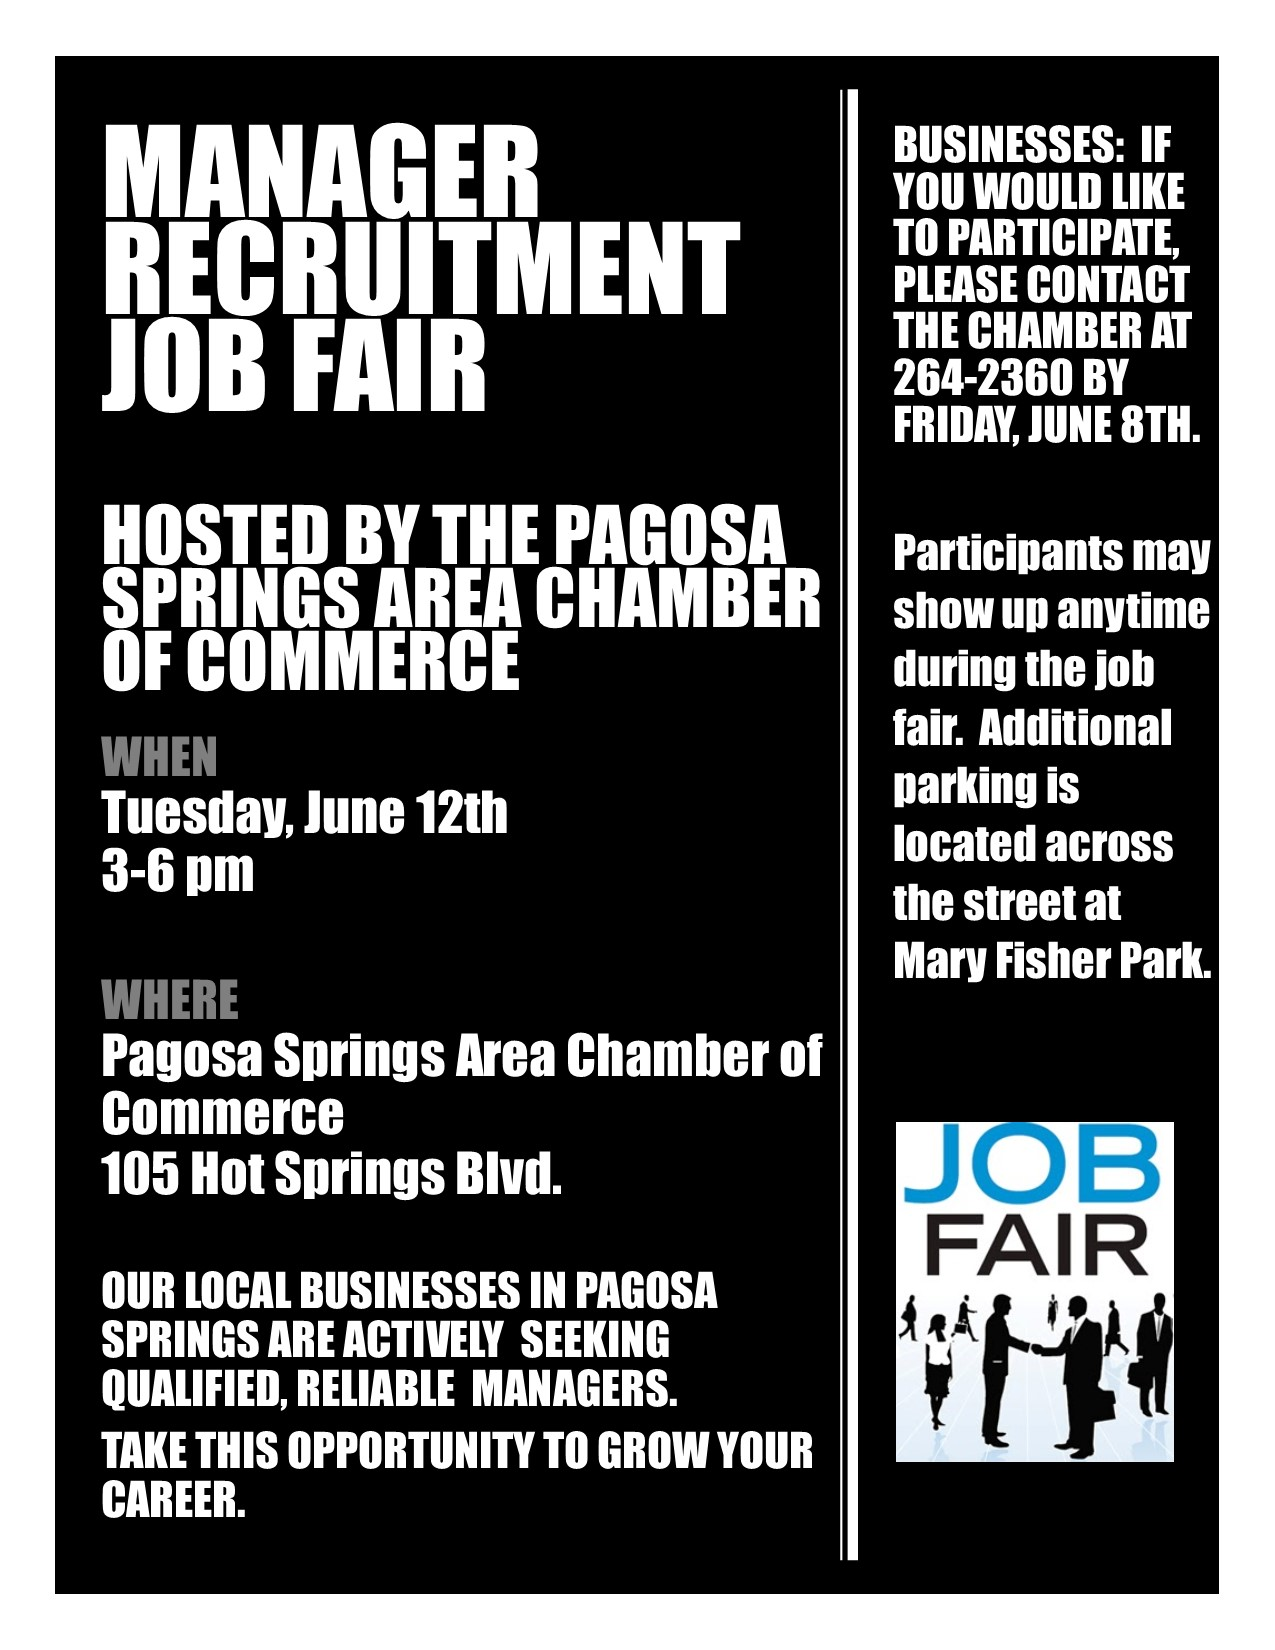 manager recruitment job fair pagosa springs chamber